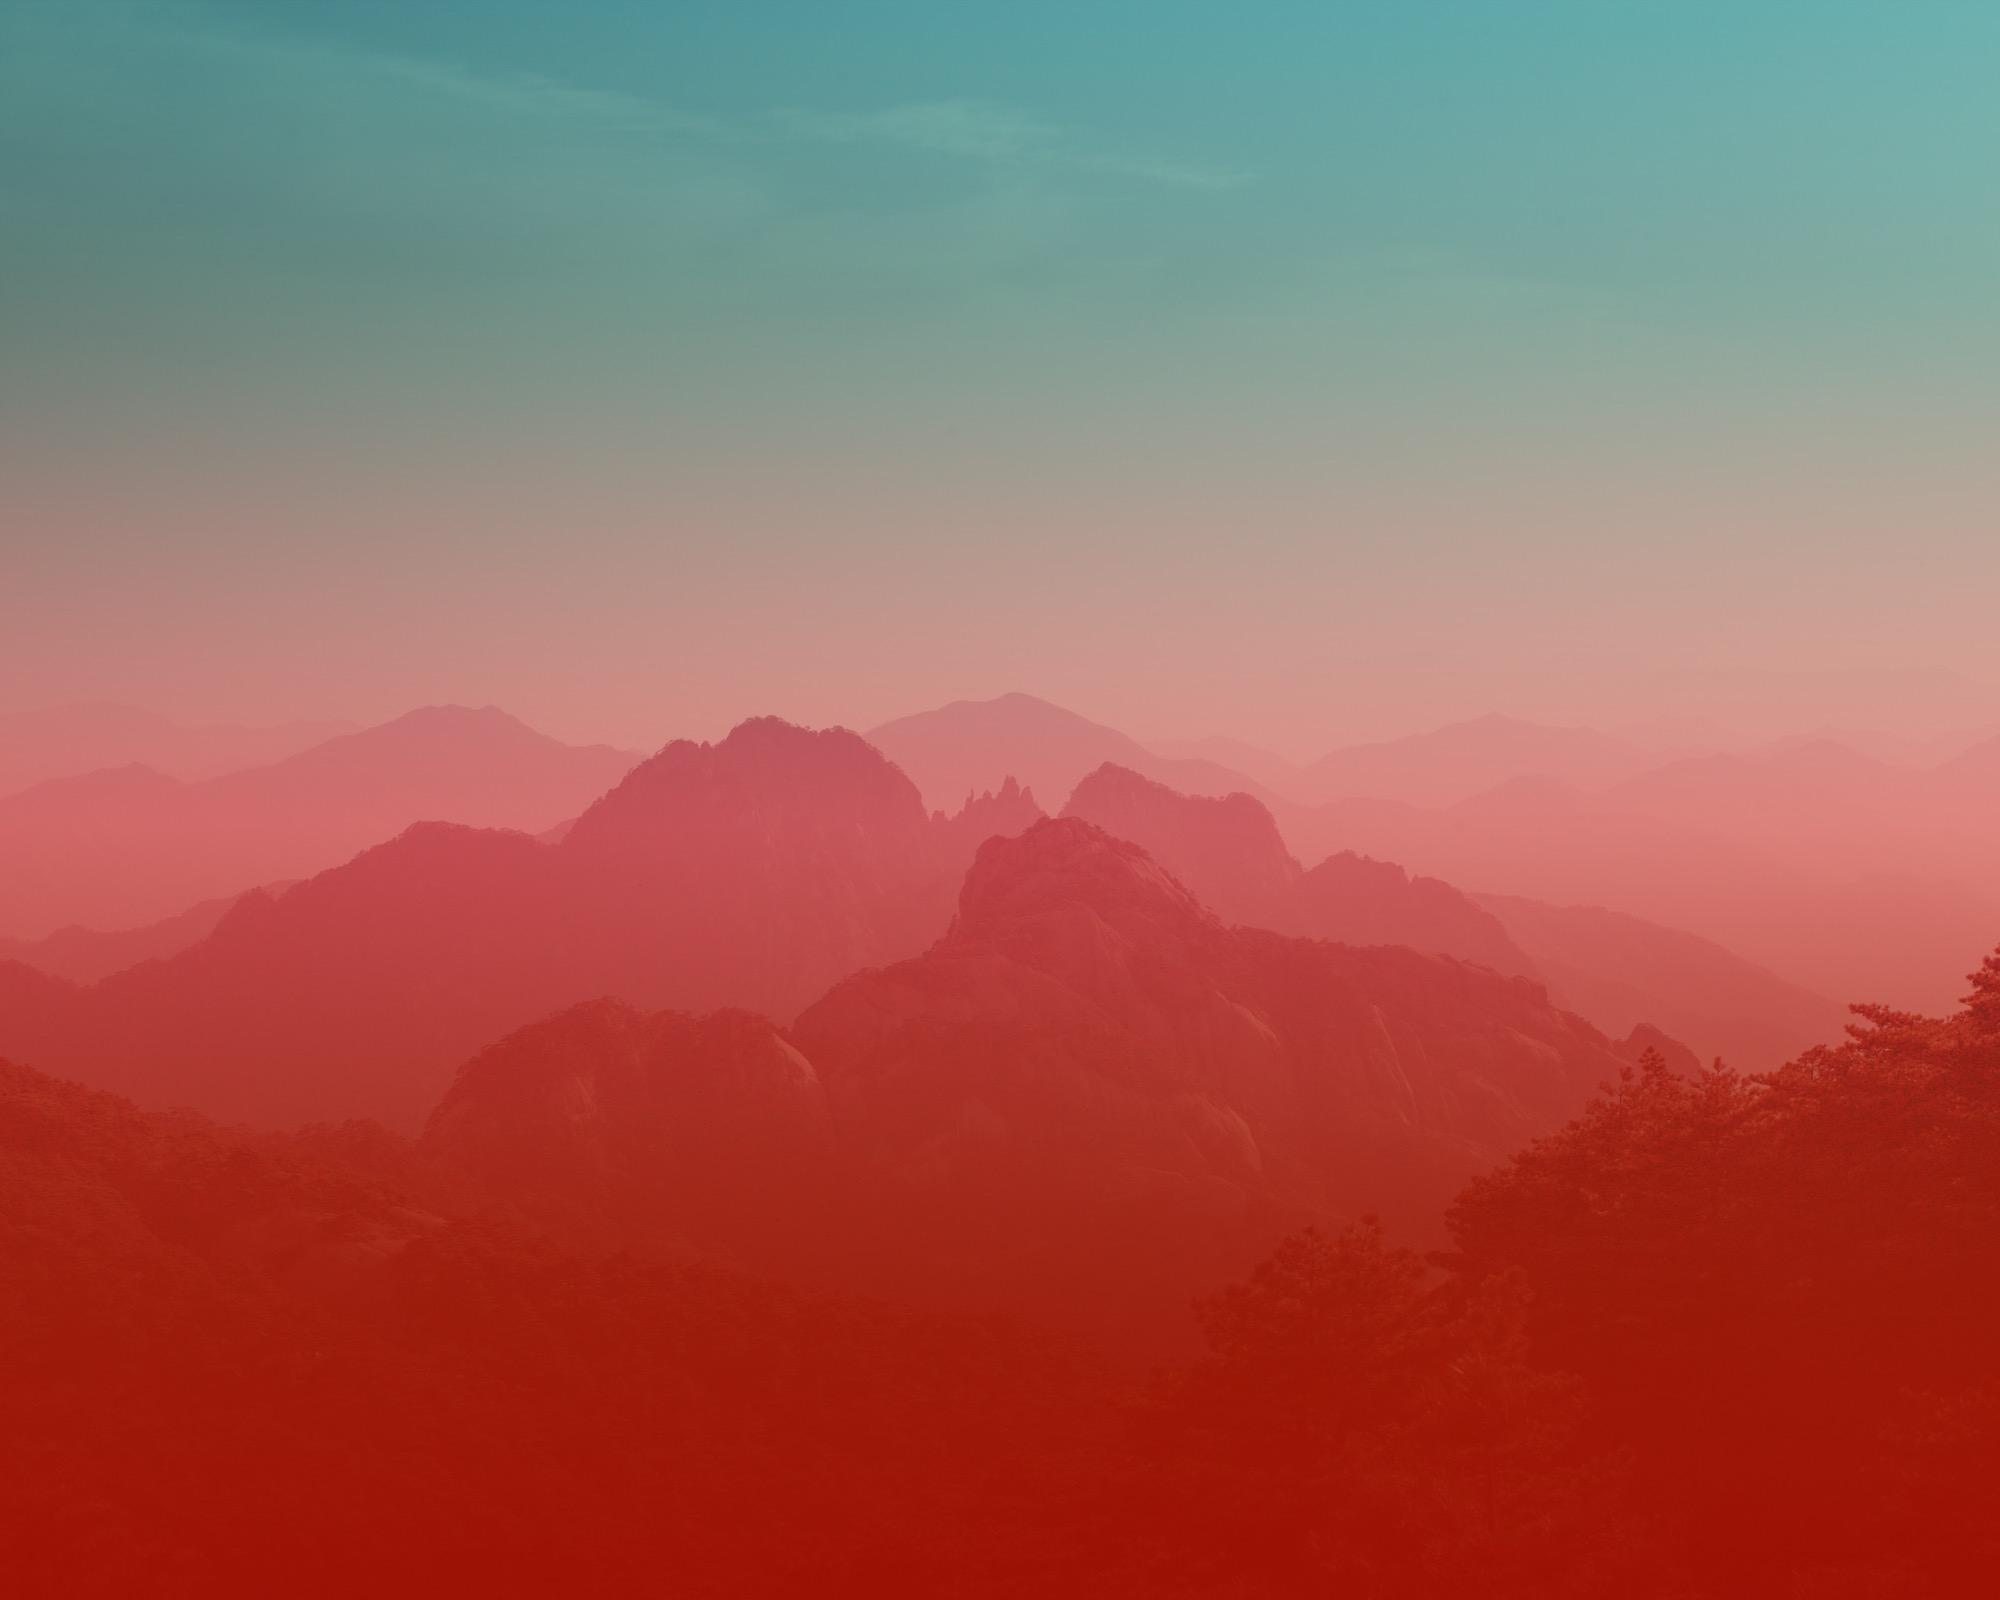 Alpine Modern + JK Editions | By Jamie Kripke, published in Alpine Modern magazine issue 03